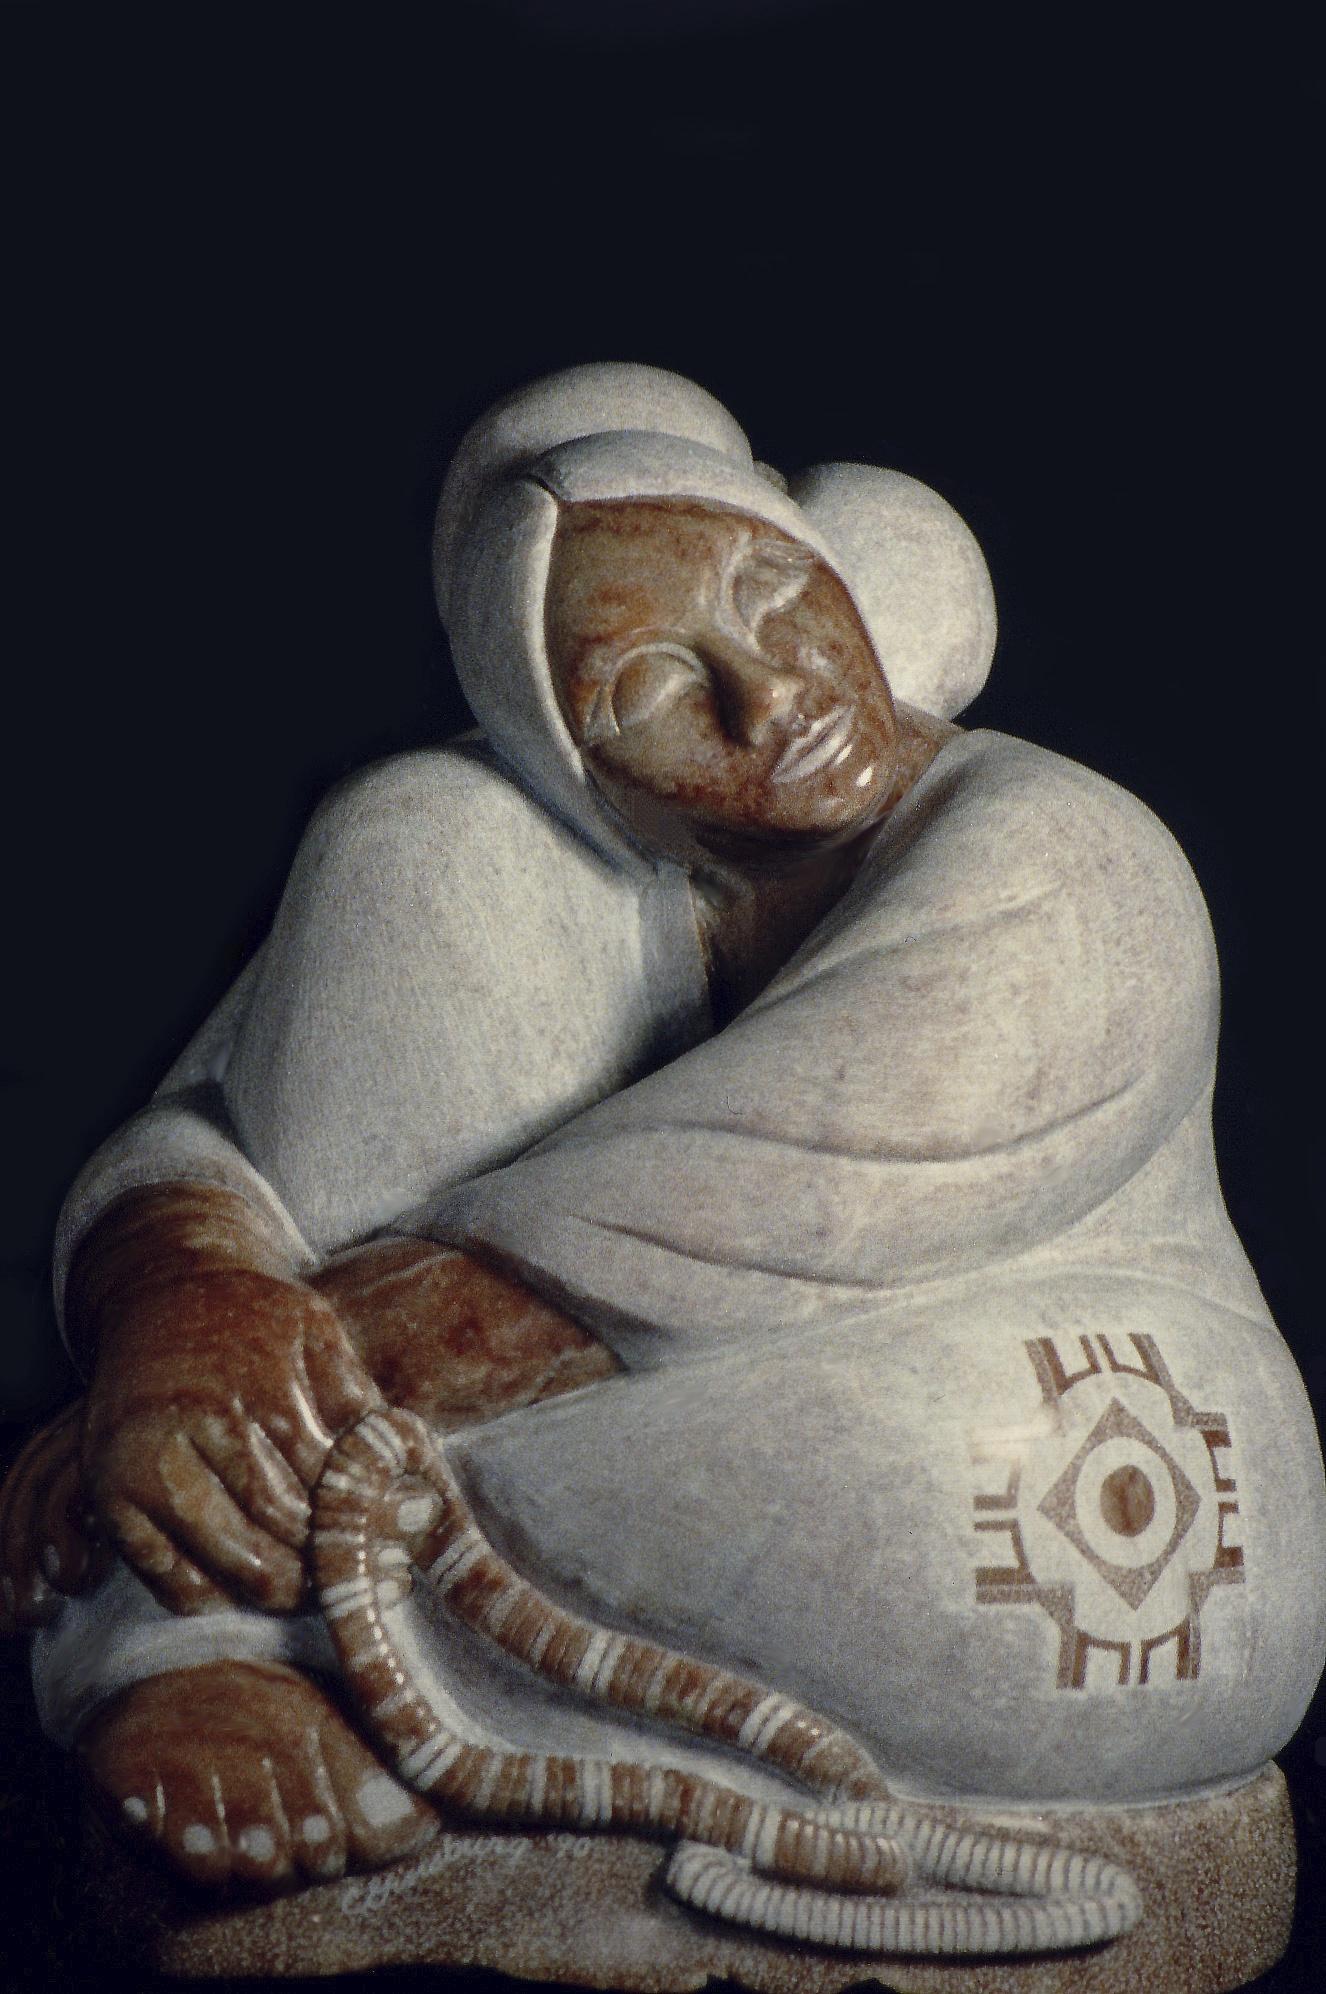 """Daydreamer"" by Cheri Ginsburg©  Dimensions '90 National 3-Dimentional Art Show, Lenexa, KS"